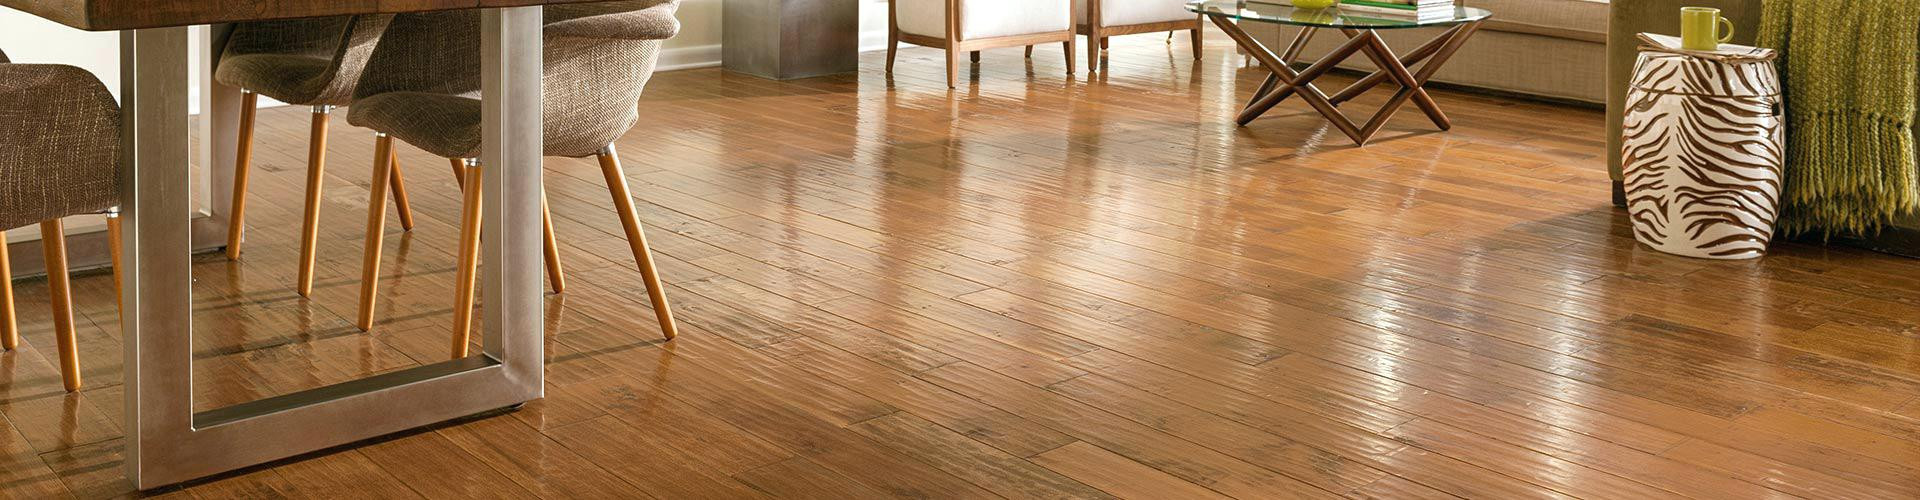 Hardwood Over Tile Flooring Installation Of 16 Luxury Cost to Install Ceramic Tile Floor Accroalamode for Cost to Install Ceramic Tile Floor Unique Od Grain Tile Bathroom Wood Shower No Grout Porcelain